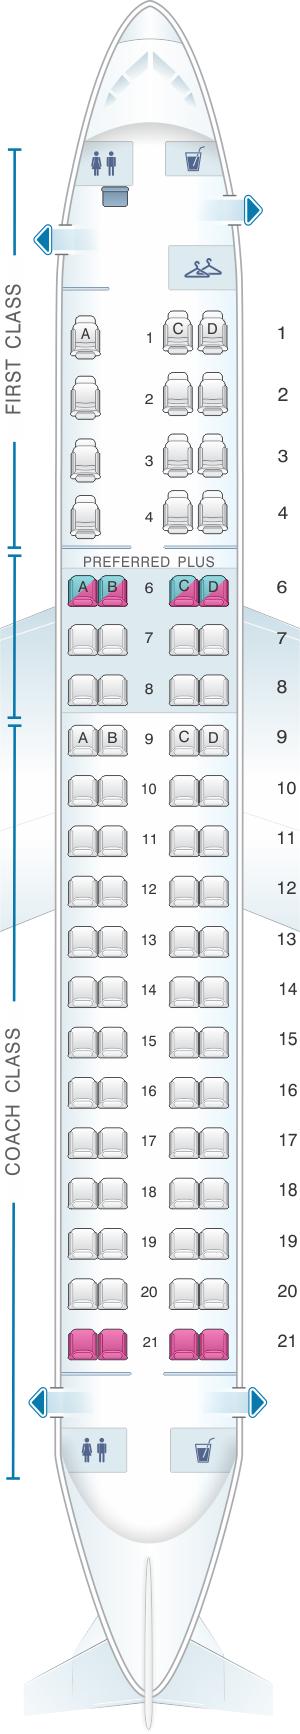 Seat map for Alaska Airlines - Horizon Air Embraer 175